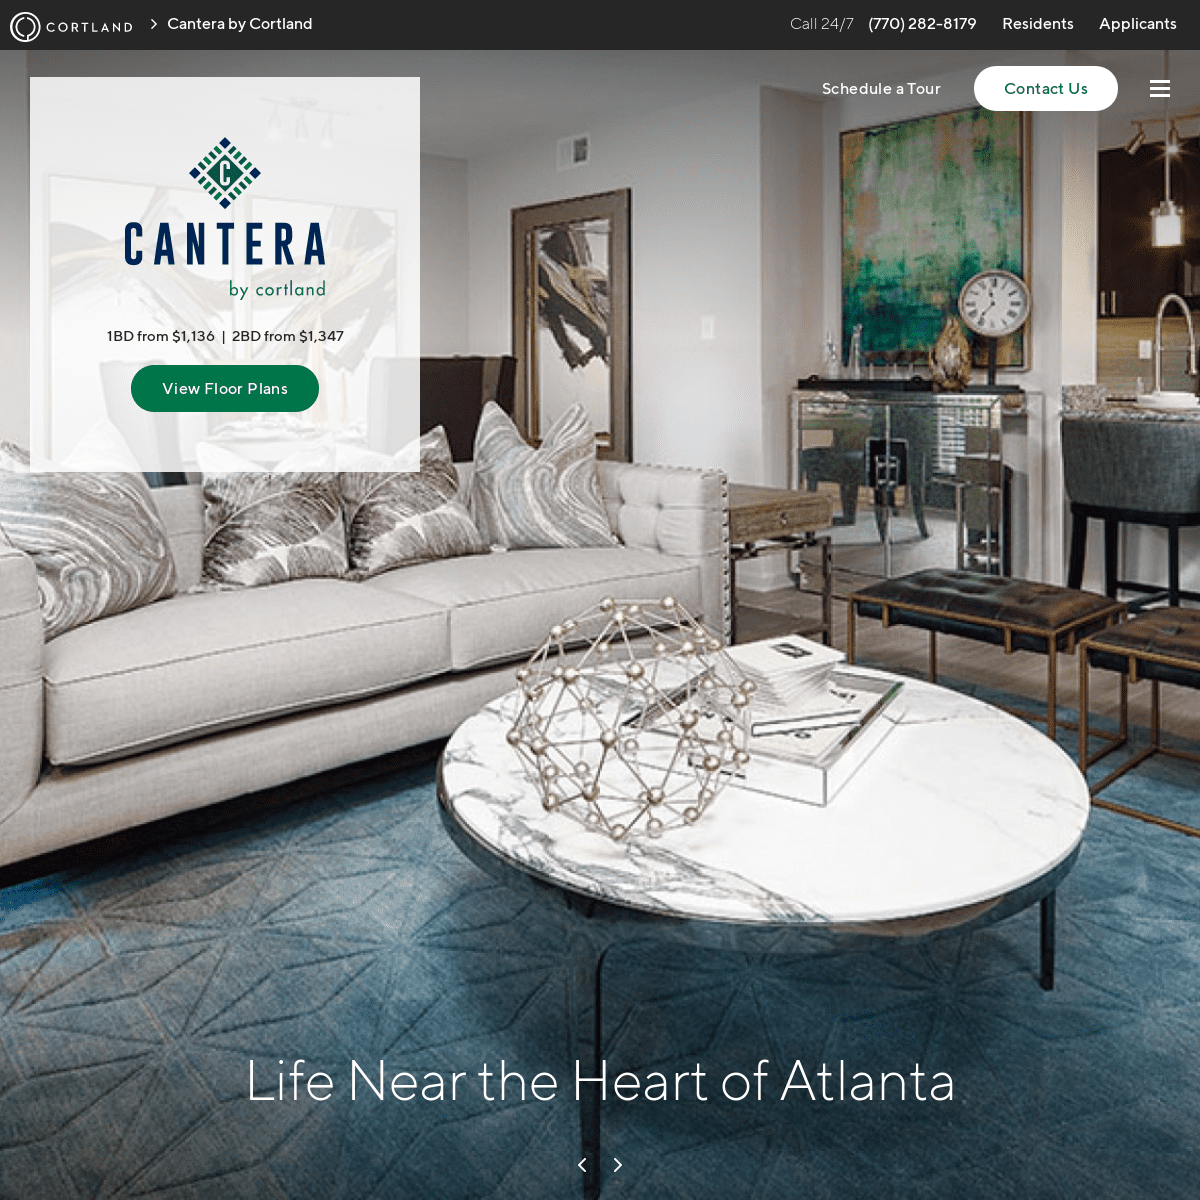 Apartments for rent in Atlanta, GA - Cantera by Cortland